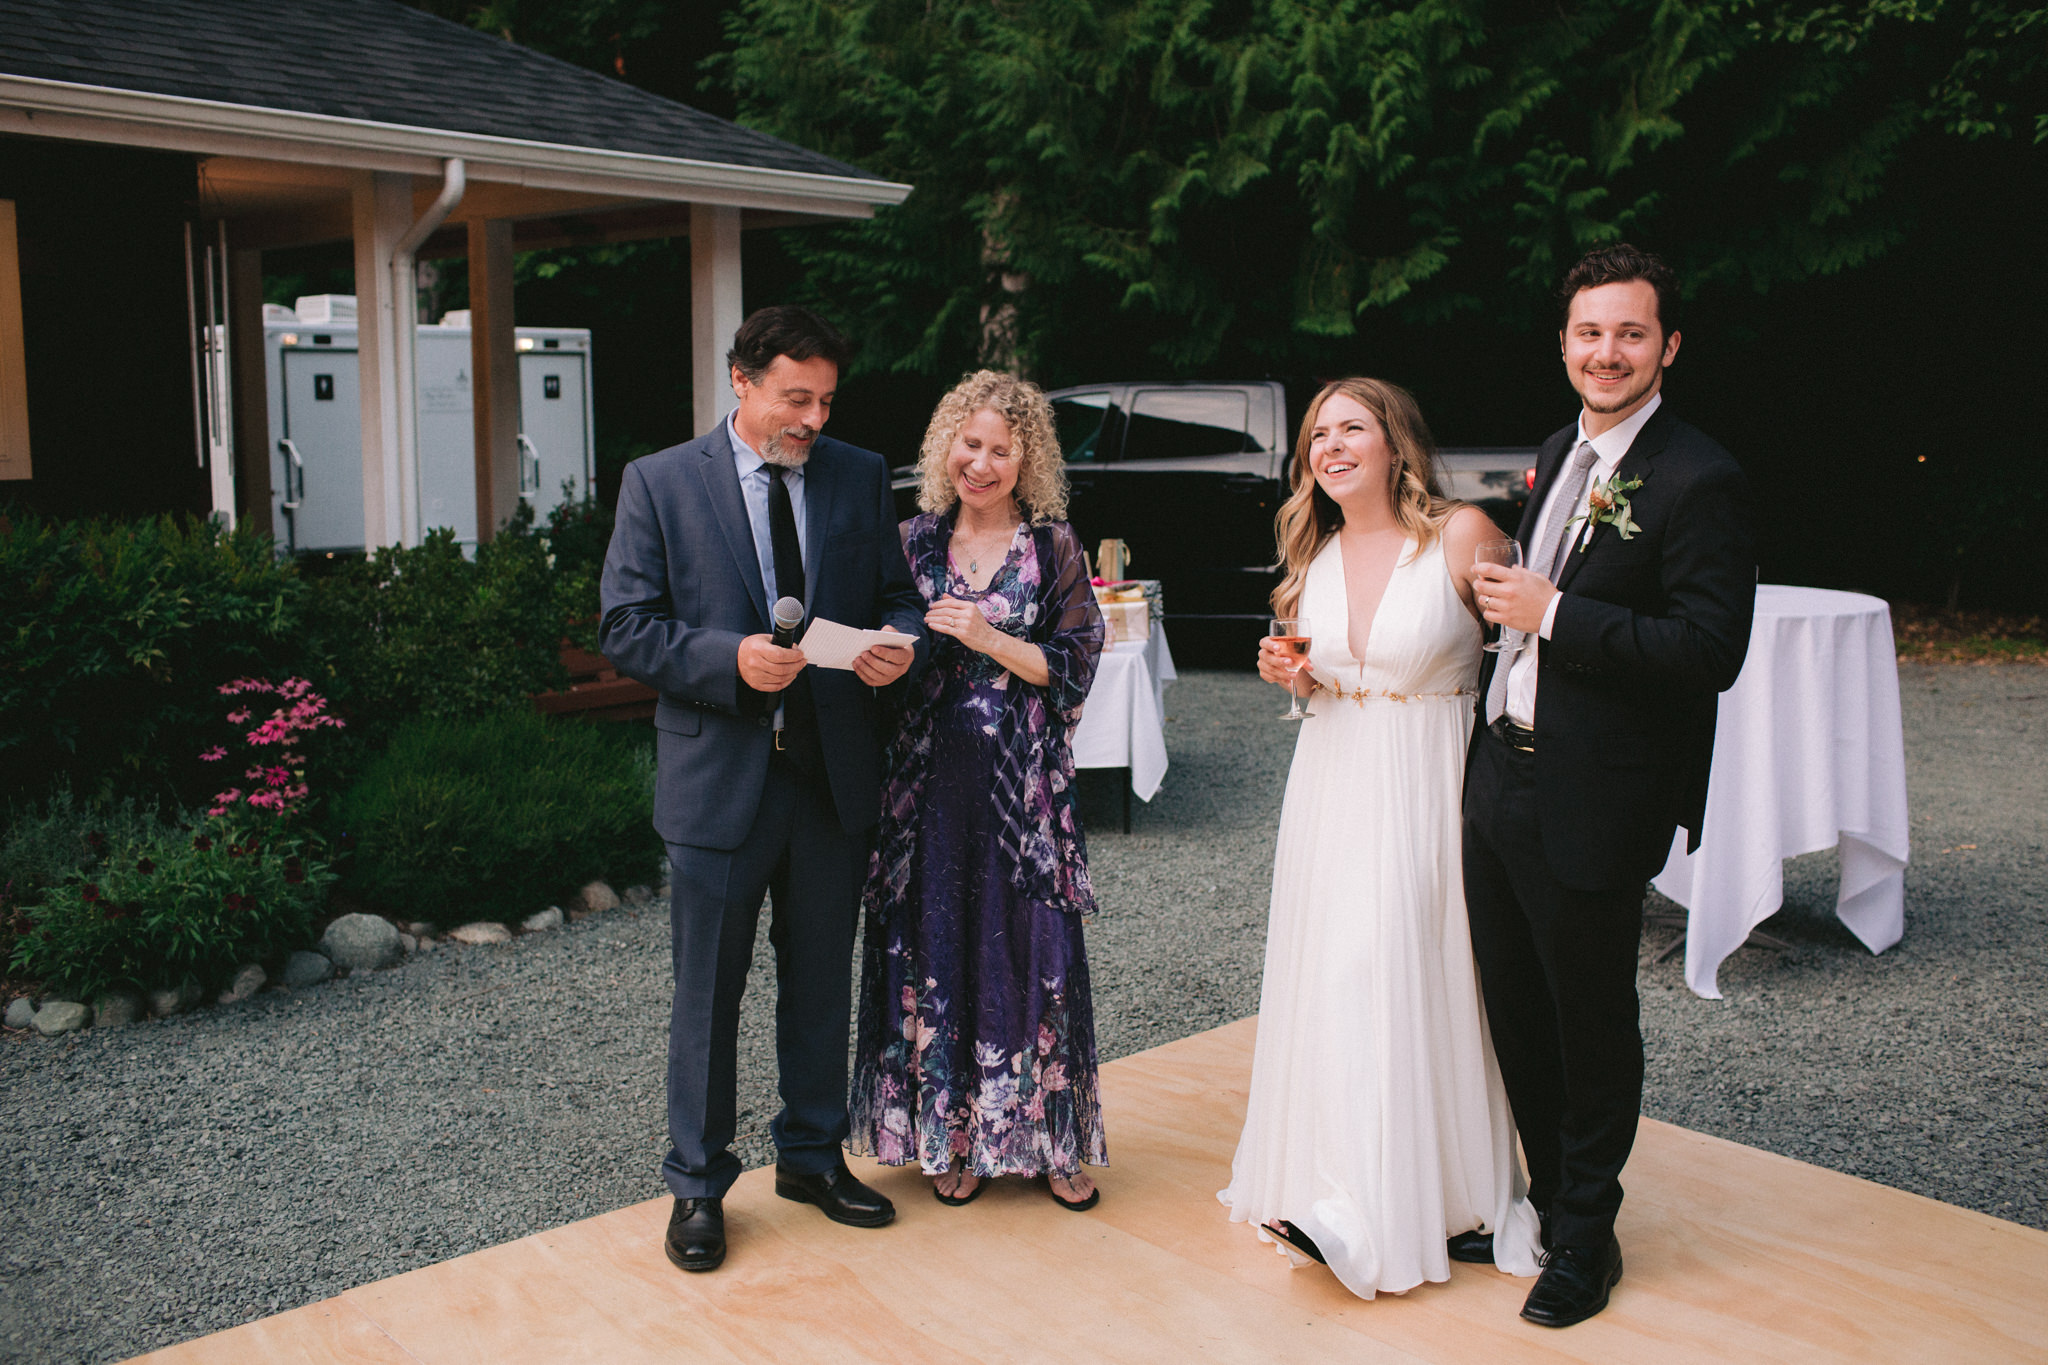 Backyard-Bainbridge-Island-Wedding-Alycia-Lovell-Photography-187.JPG